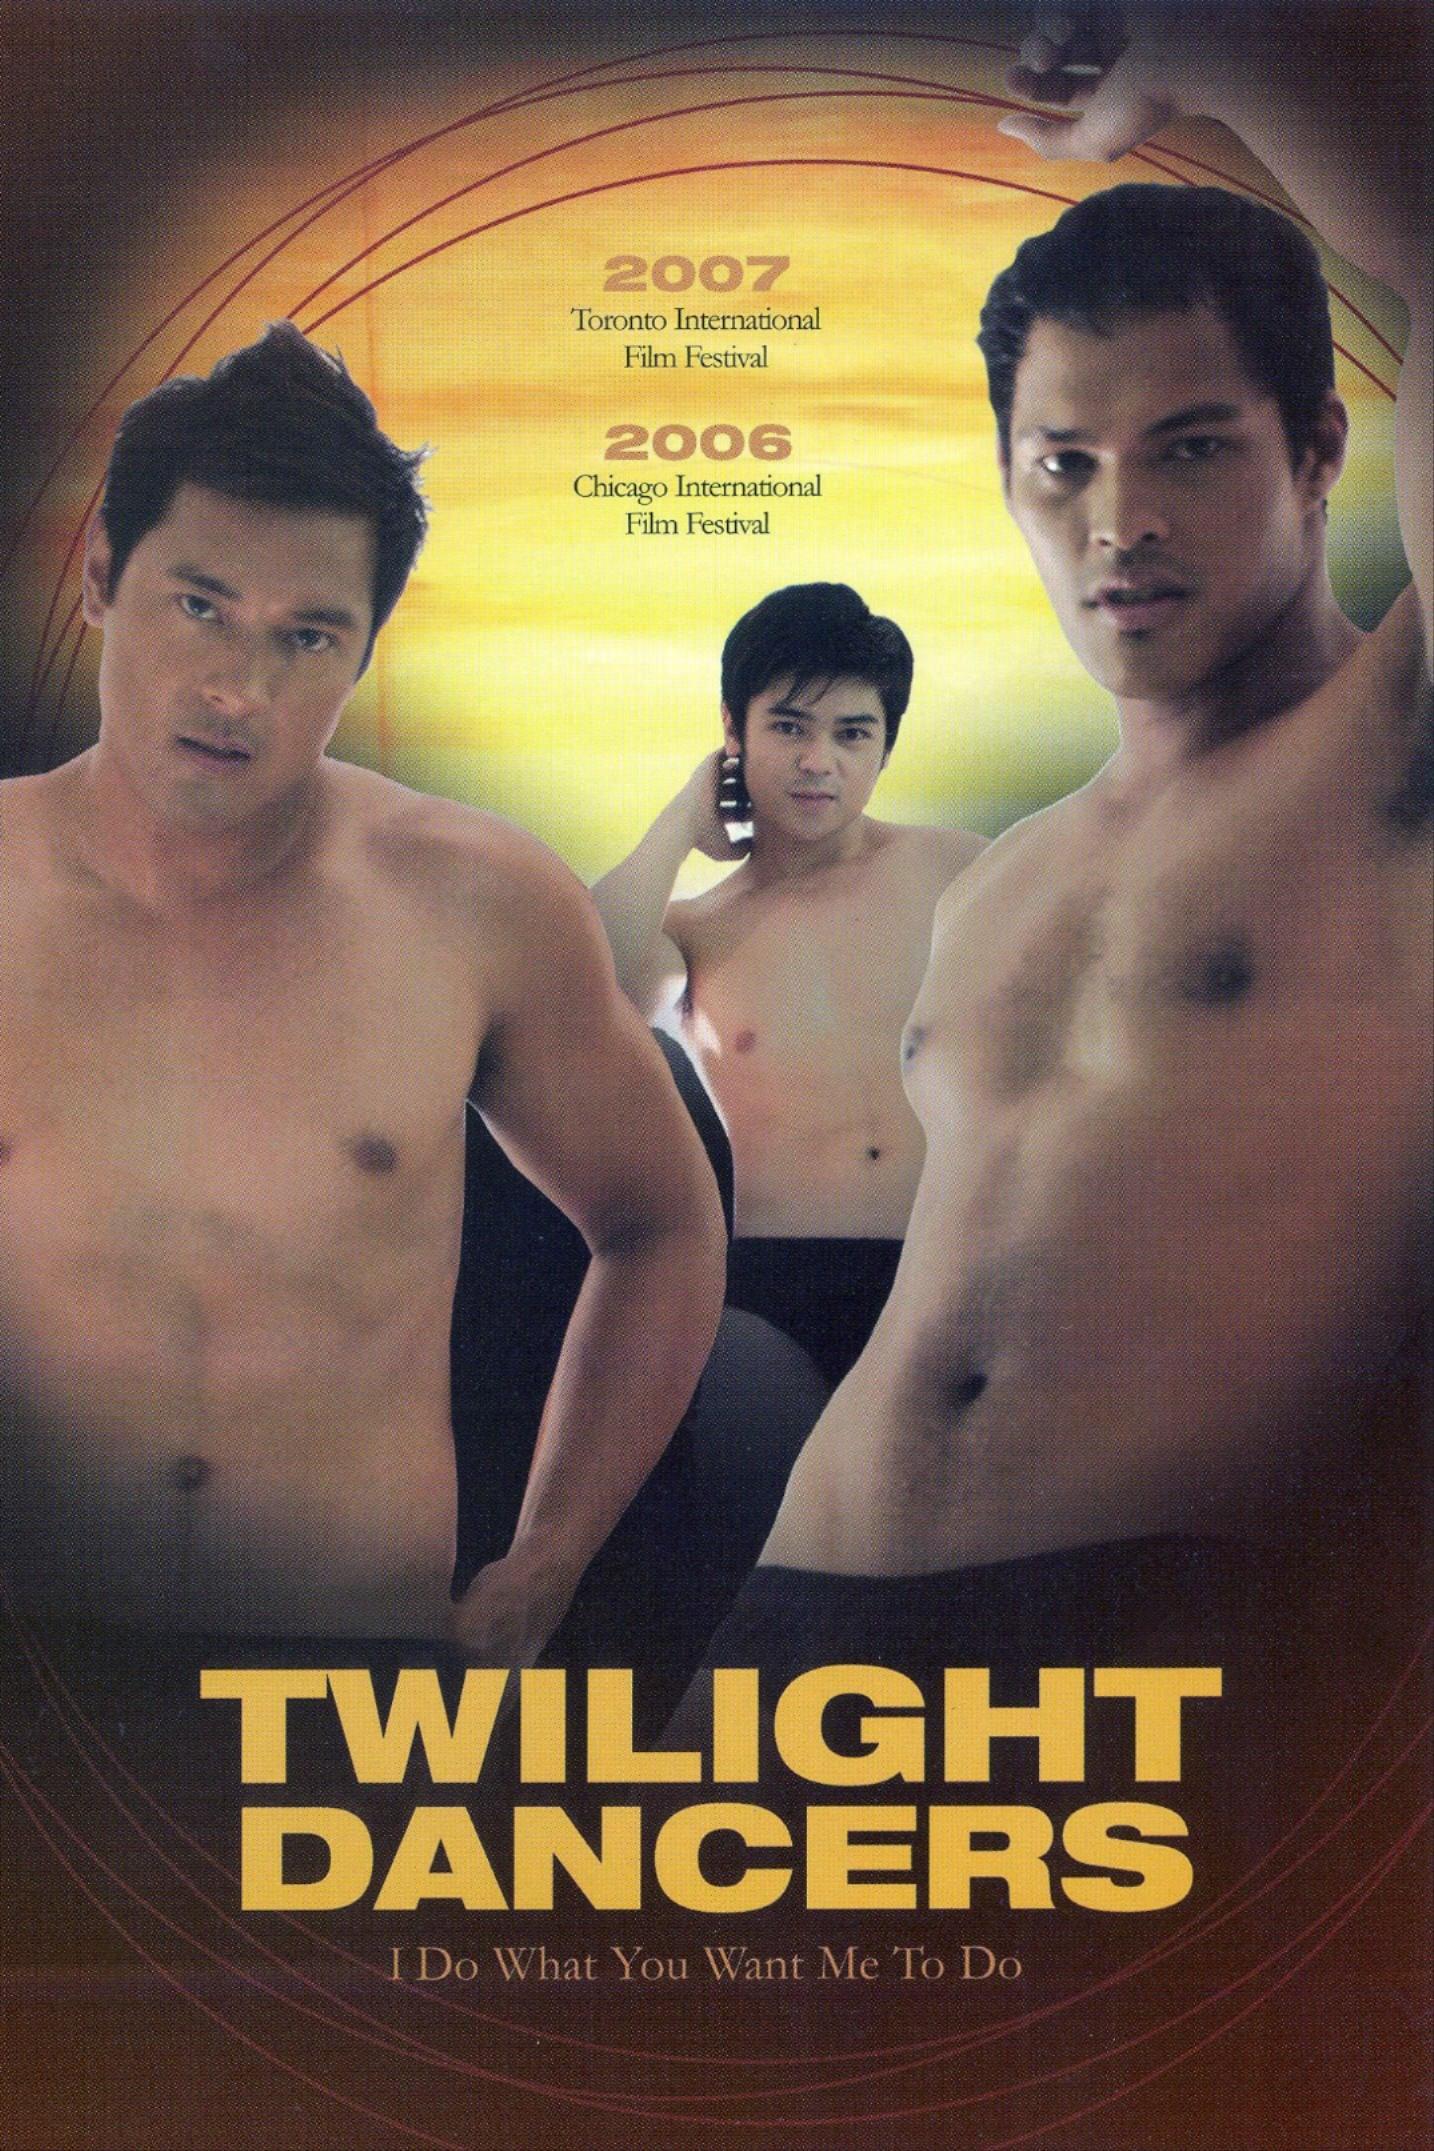 Twilight Dancers